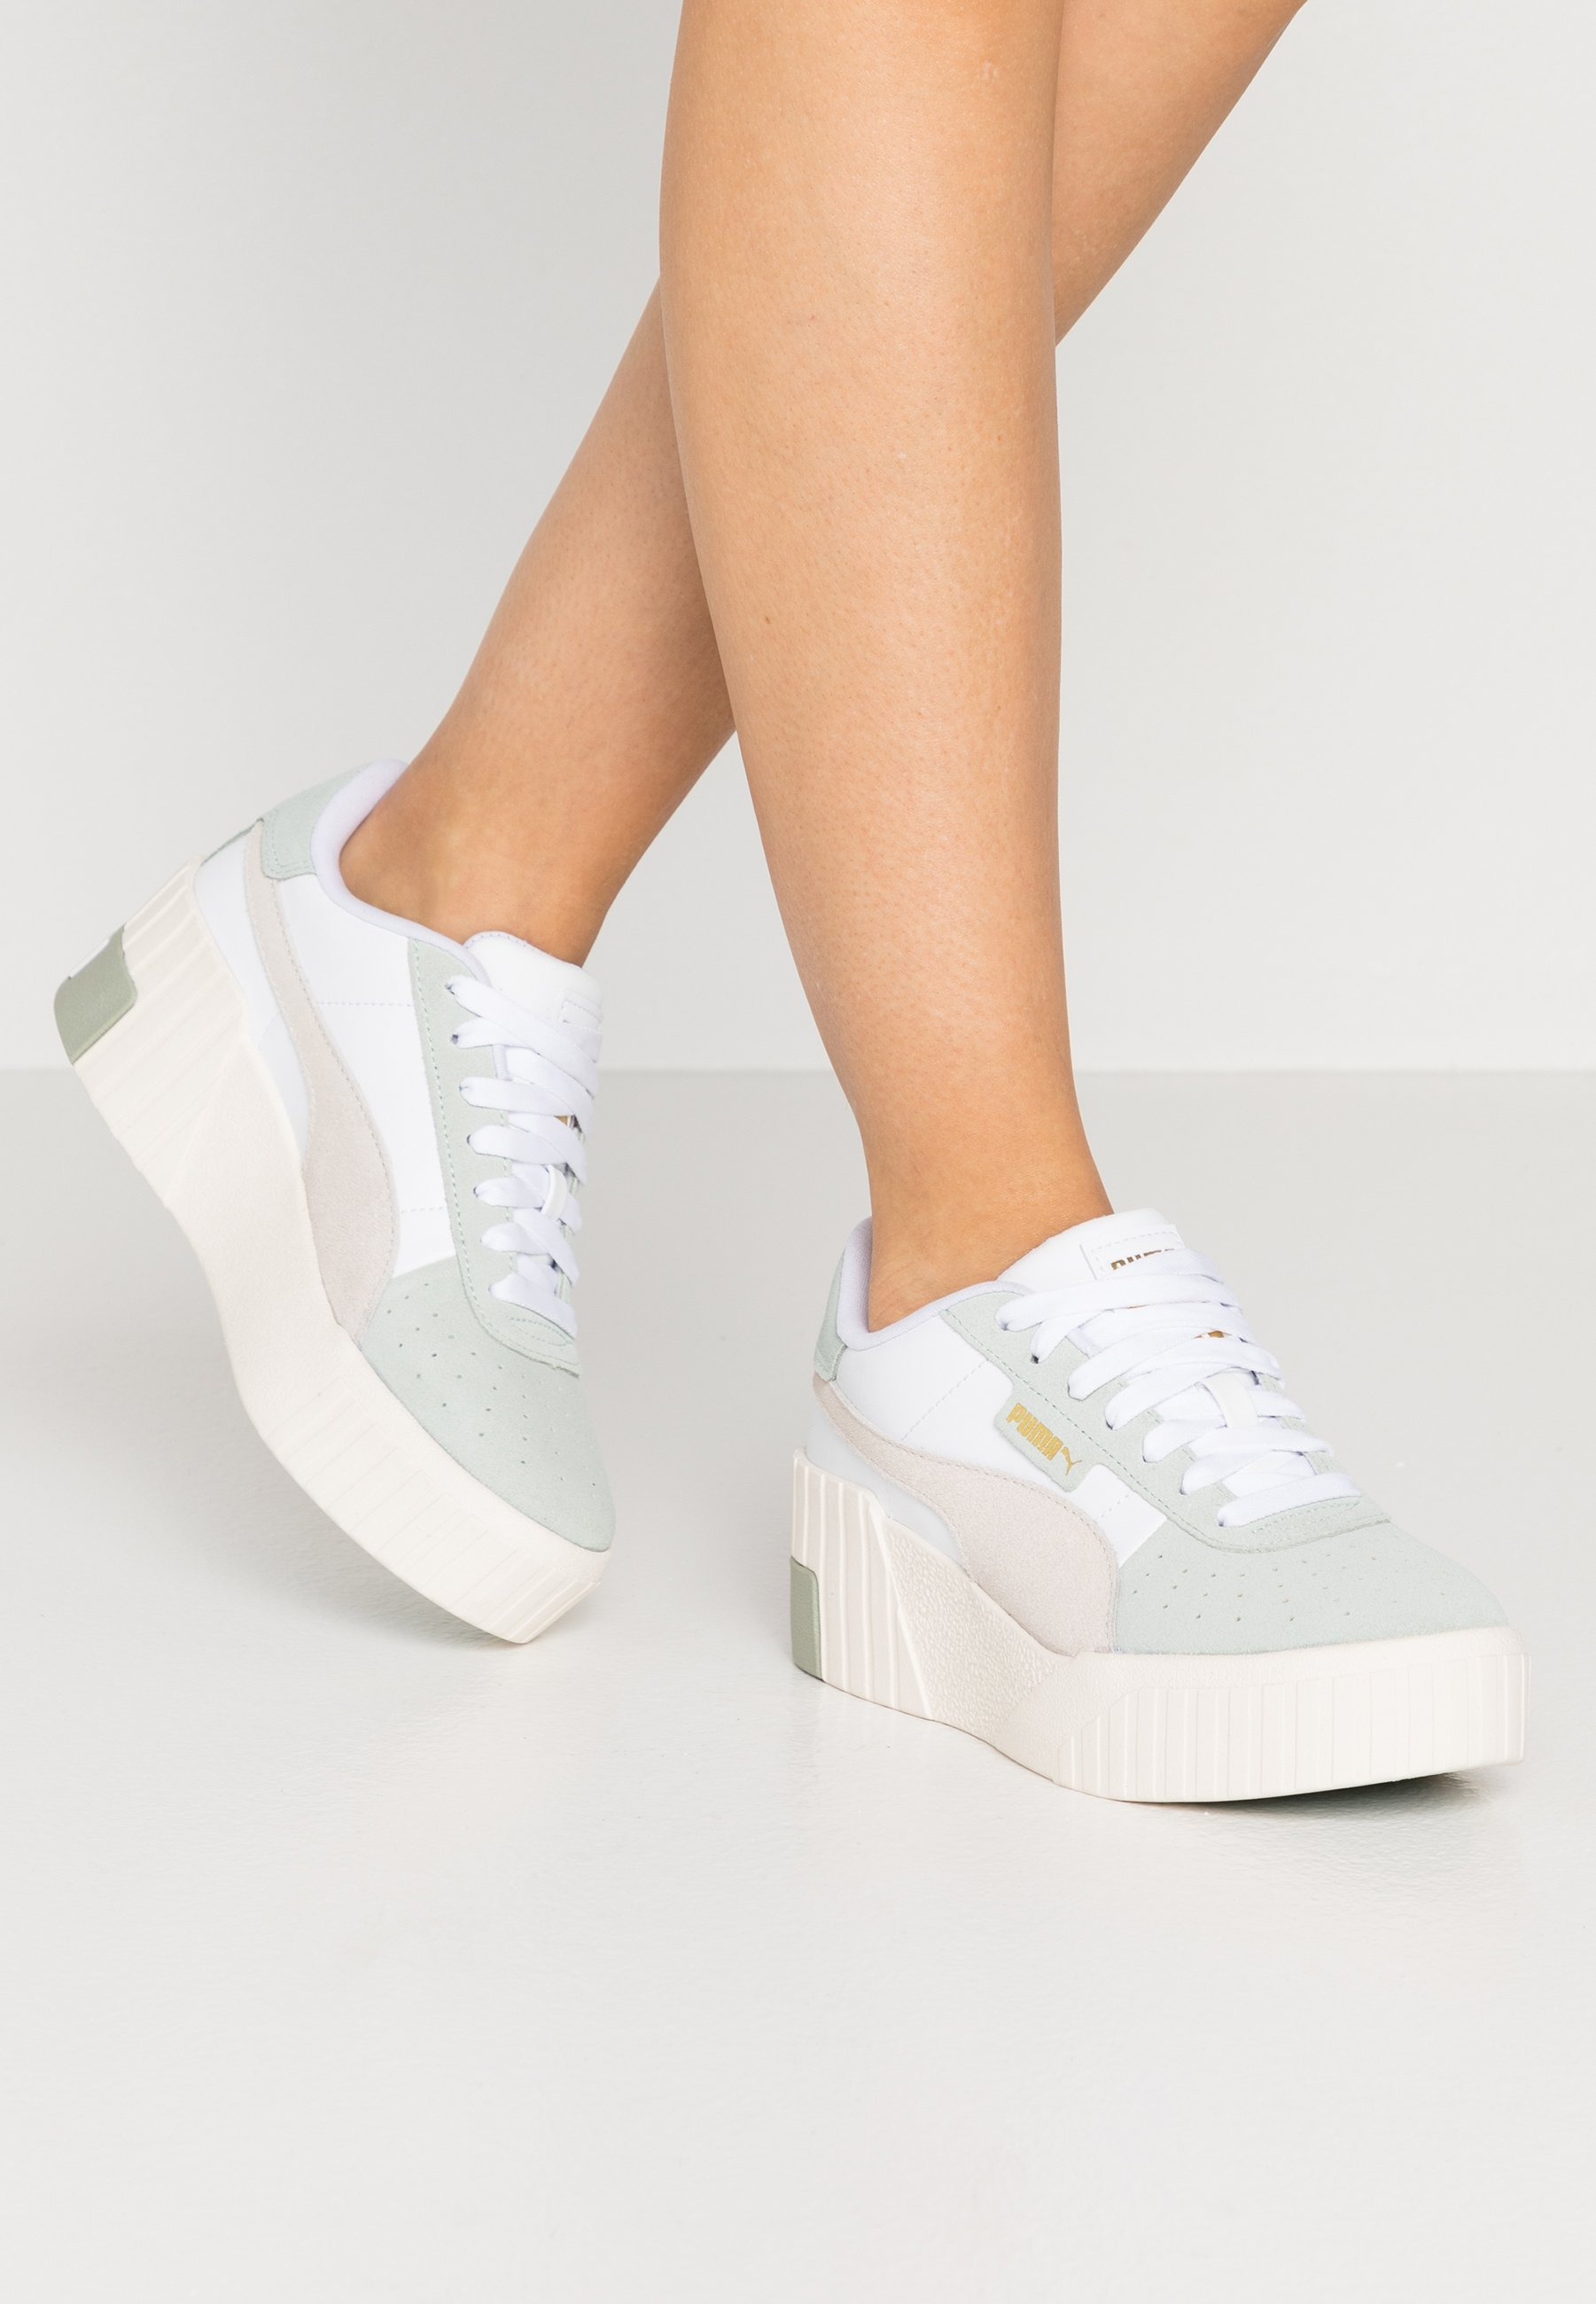 CALI WEDGE SOCAL Sneakers aqua graymarshmallowwhite